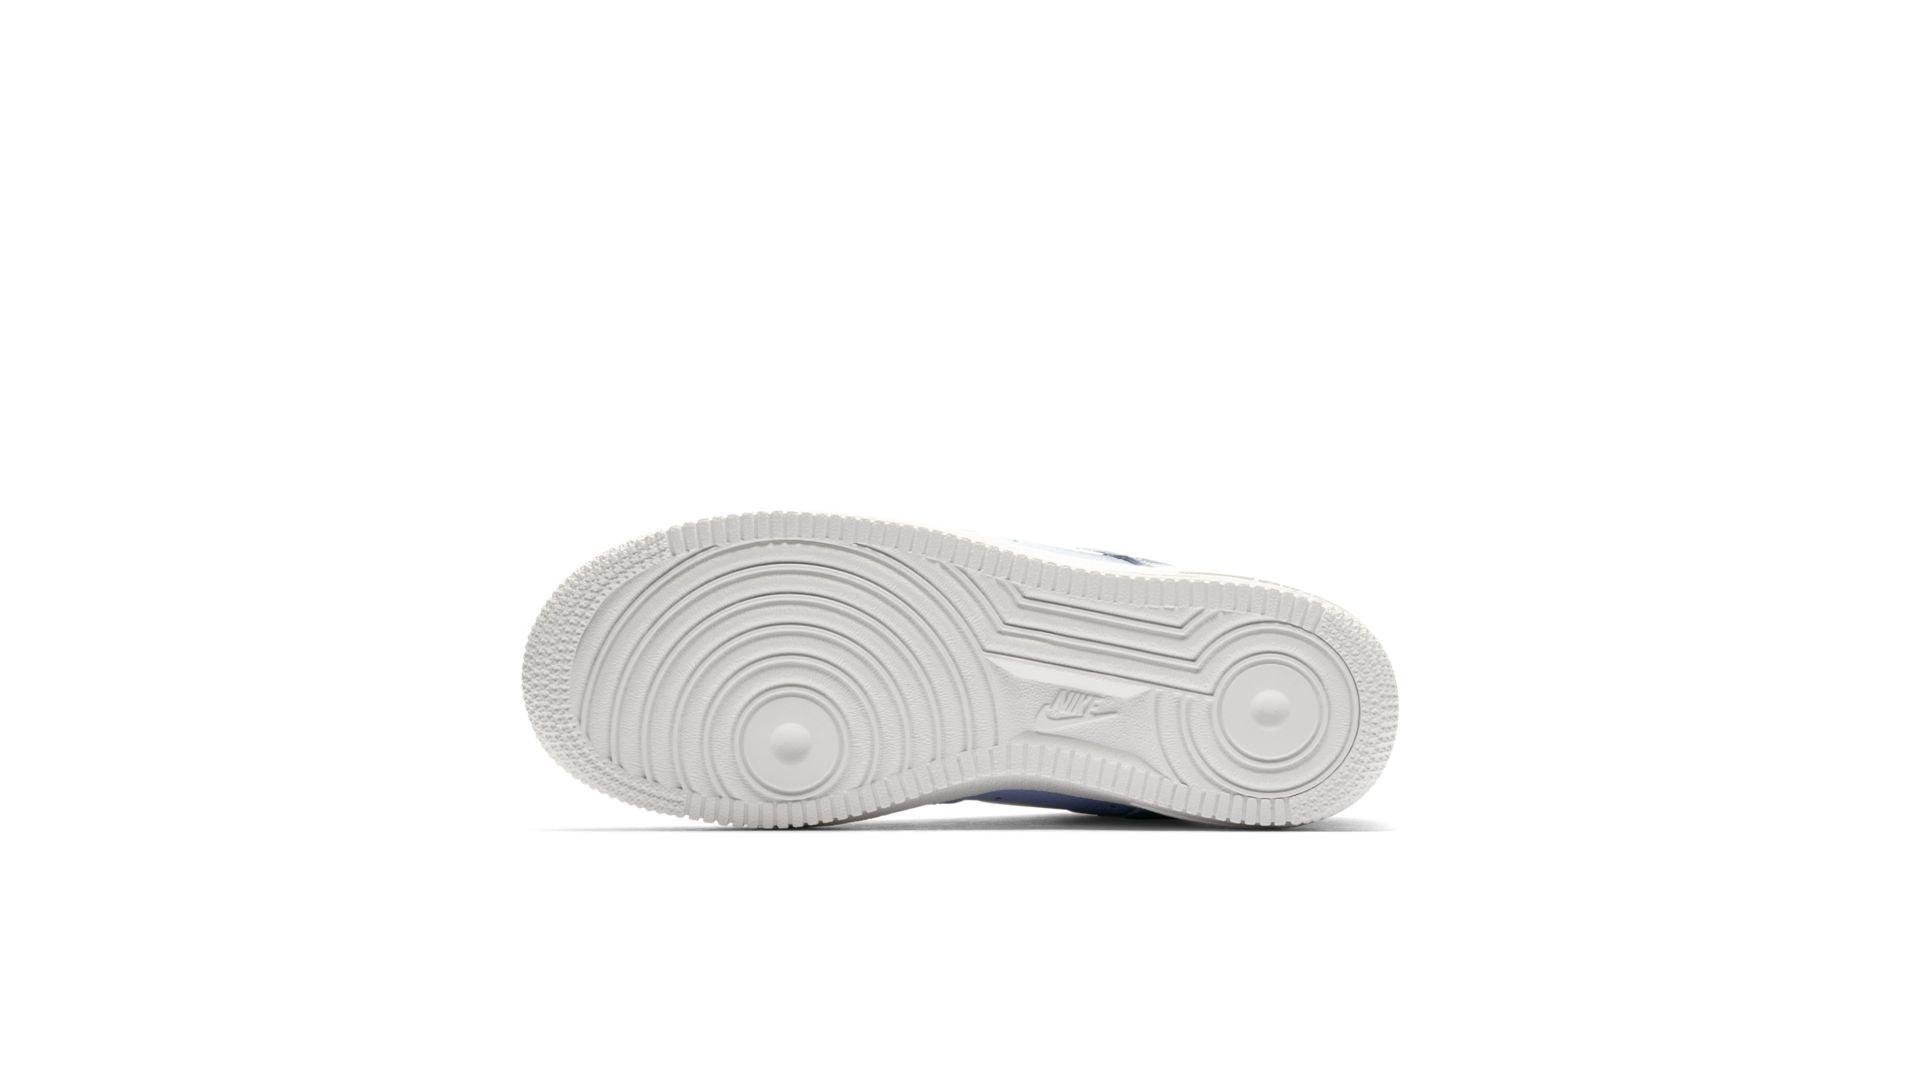 Nike Wmns Air Force 1 `07 Premium LX 'Light Blue' (AO3814-400)